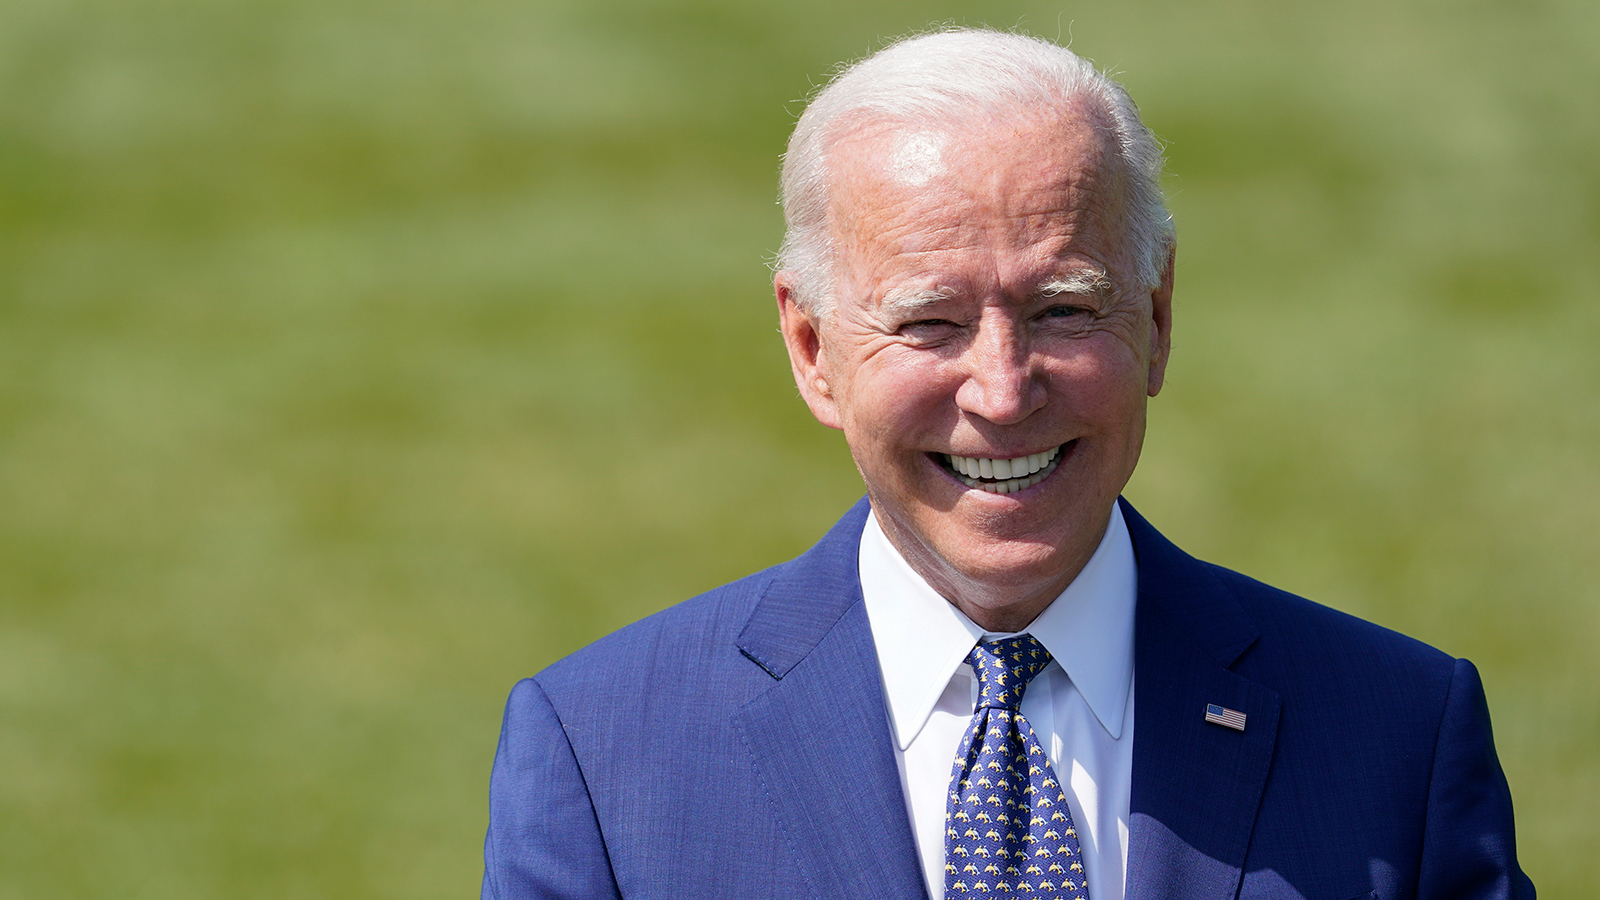 President Joe Biden speaks on the South Lawn of the White House in Washington on August 5.